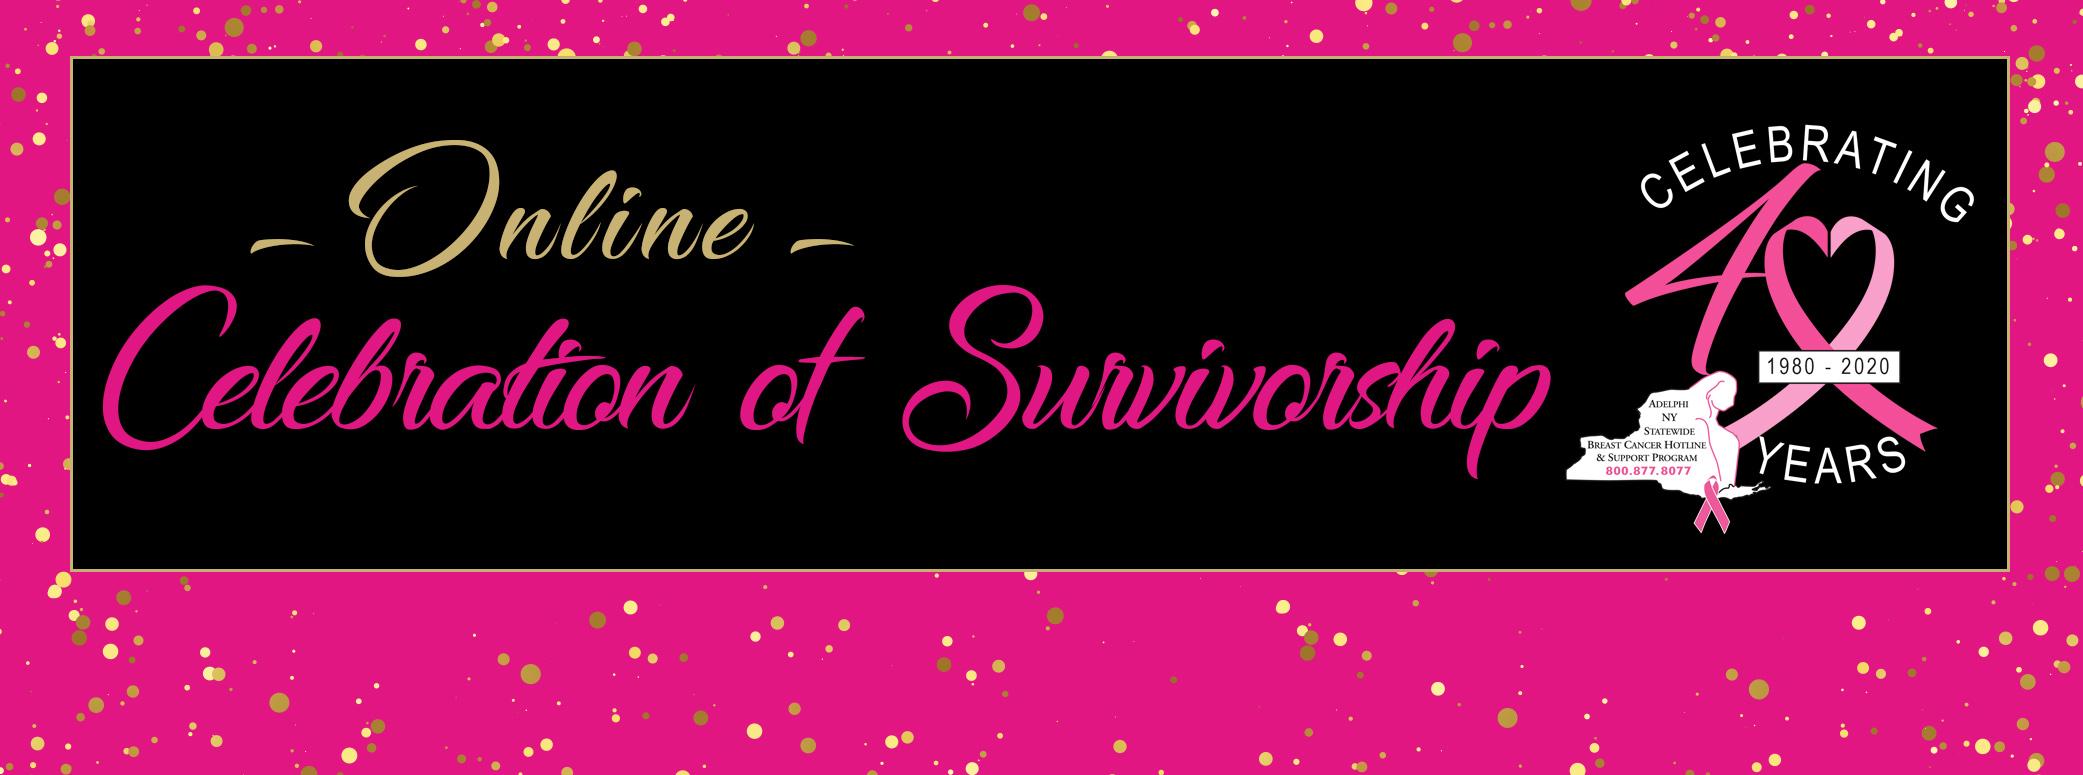 Online Celebration of Survivorship 2020